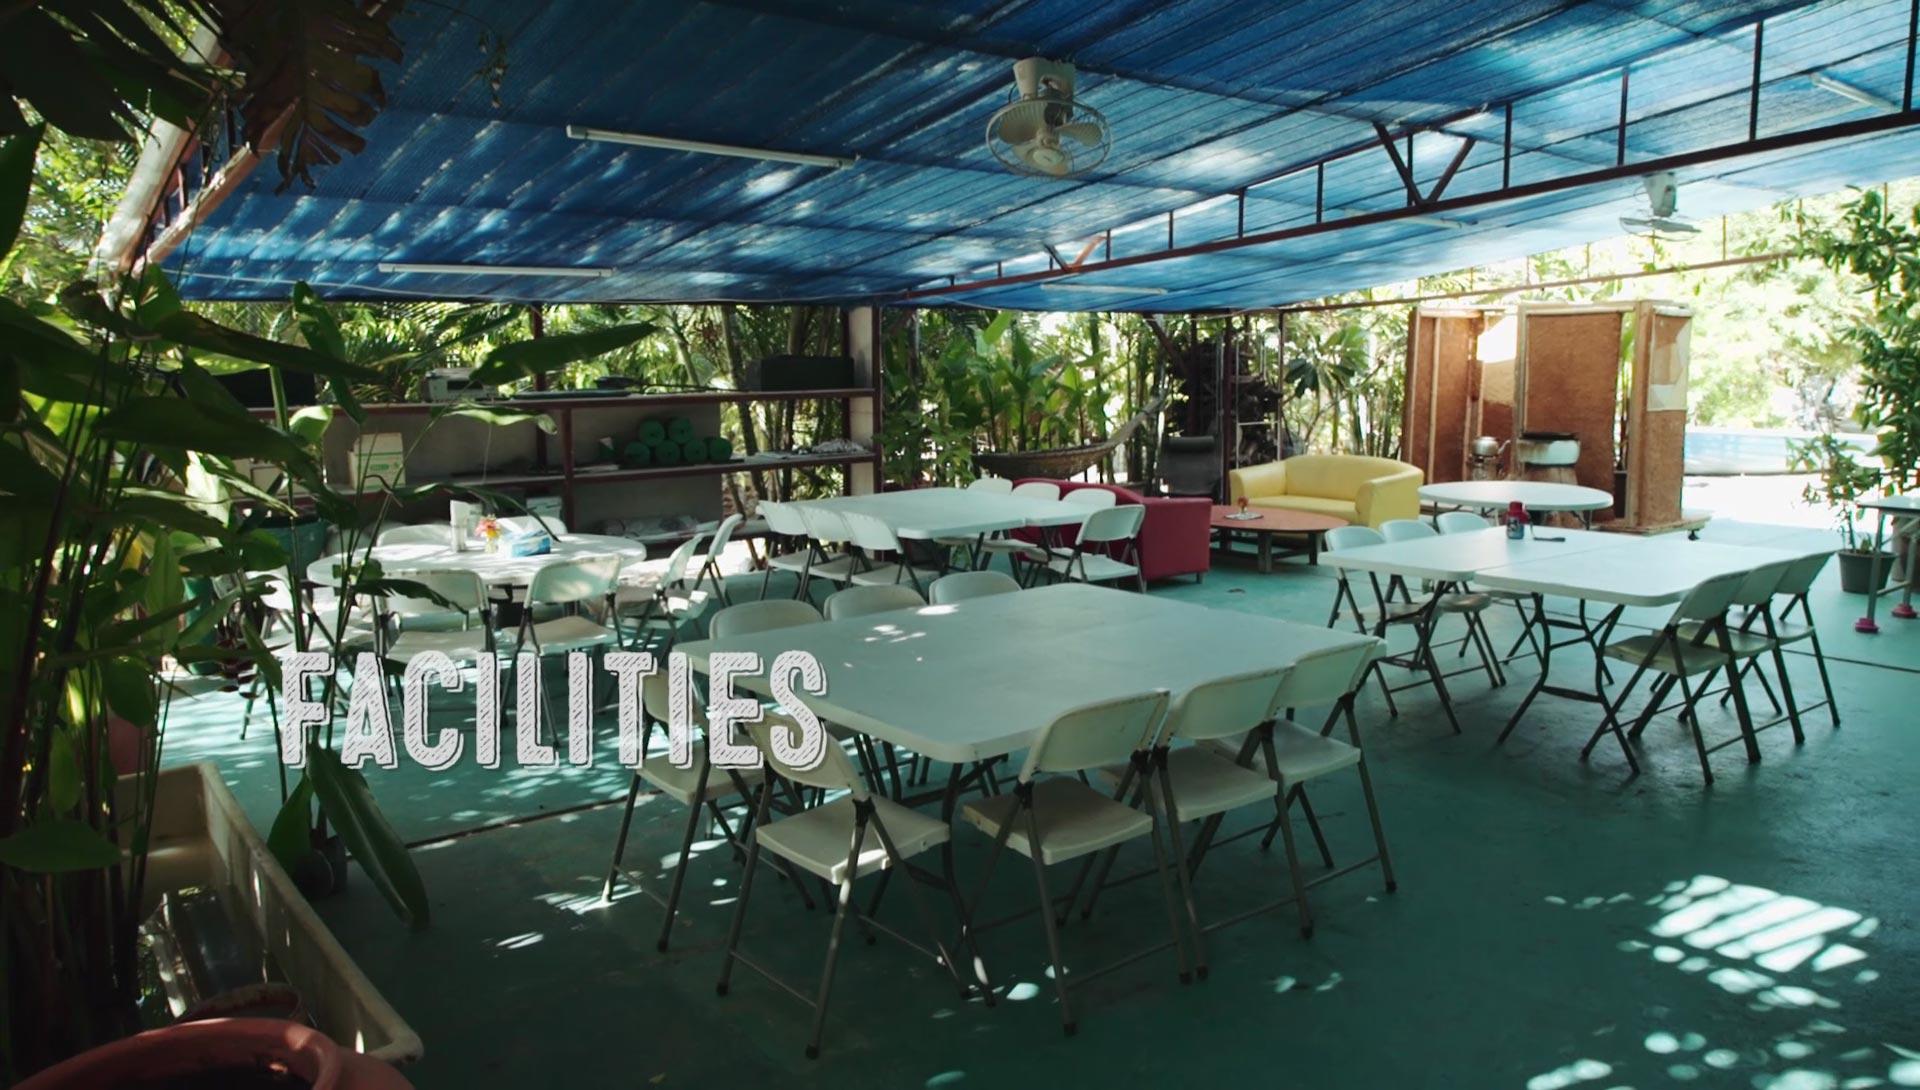 The cafeteria at Daruma ecovillage back in 2015.